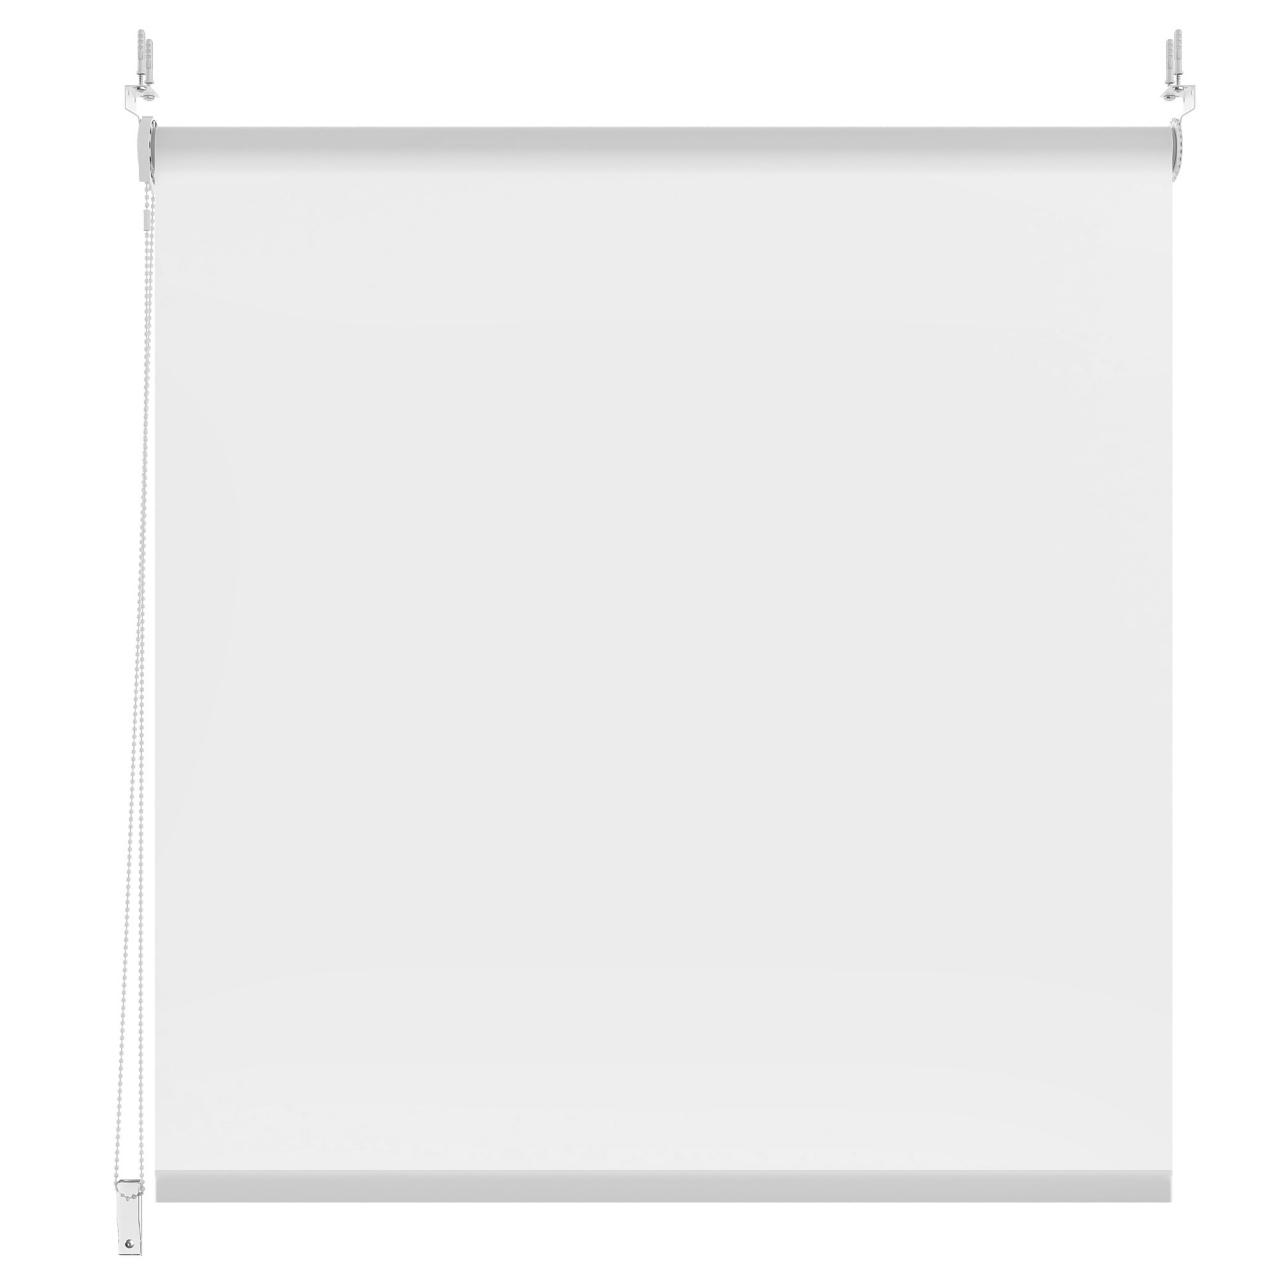 duschrollo duschvorhang badewannenvorhang dusche bad vorhang alu klemmstange ebay. Black Bedroom Furniture Sets. Home Design Ideas